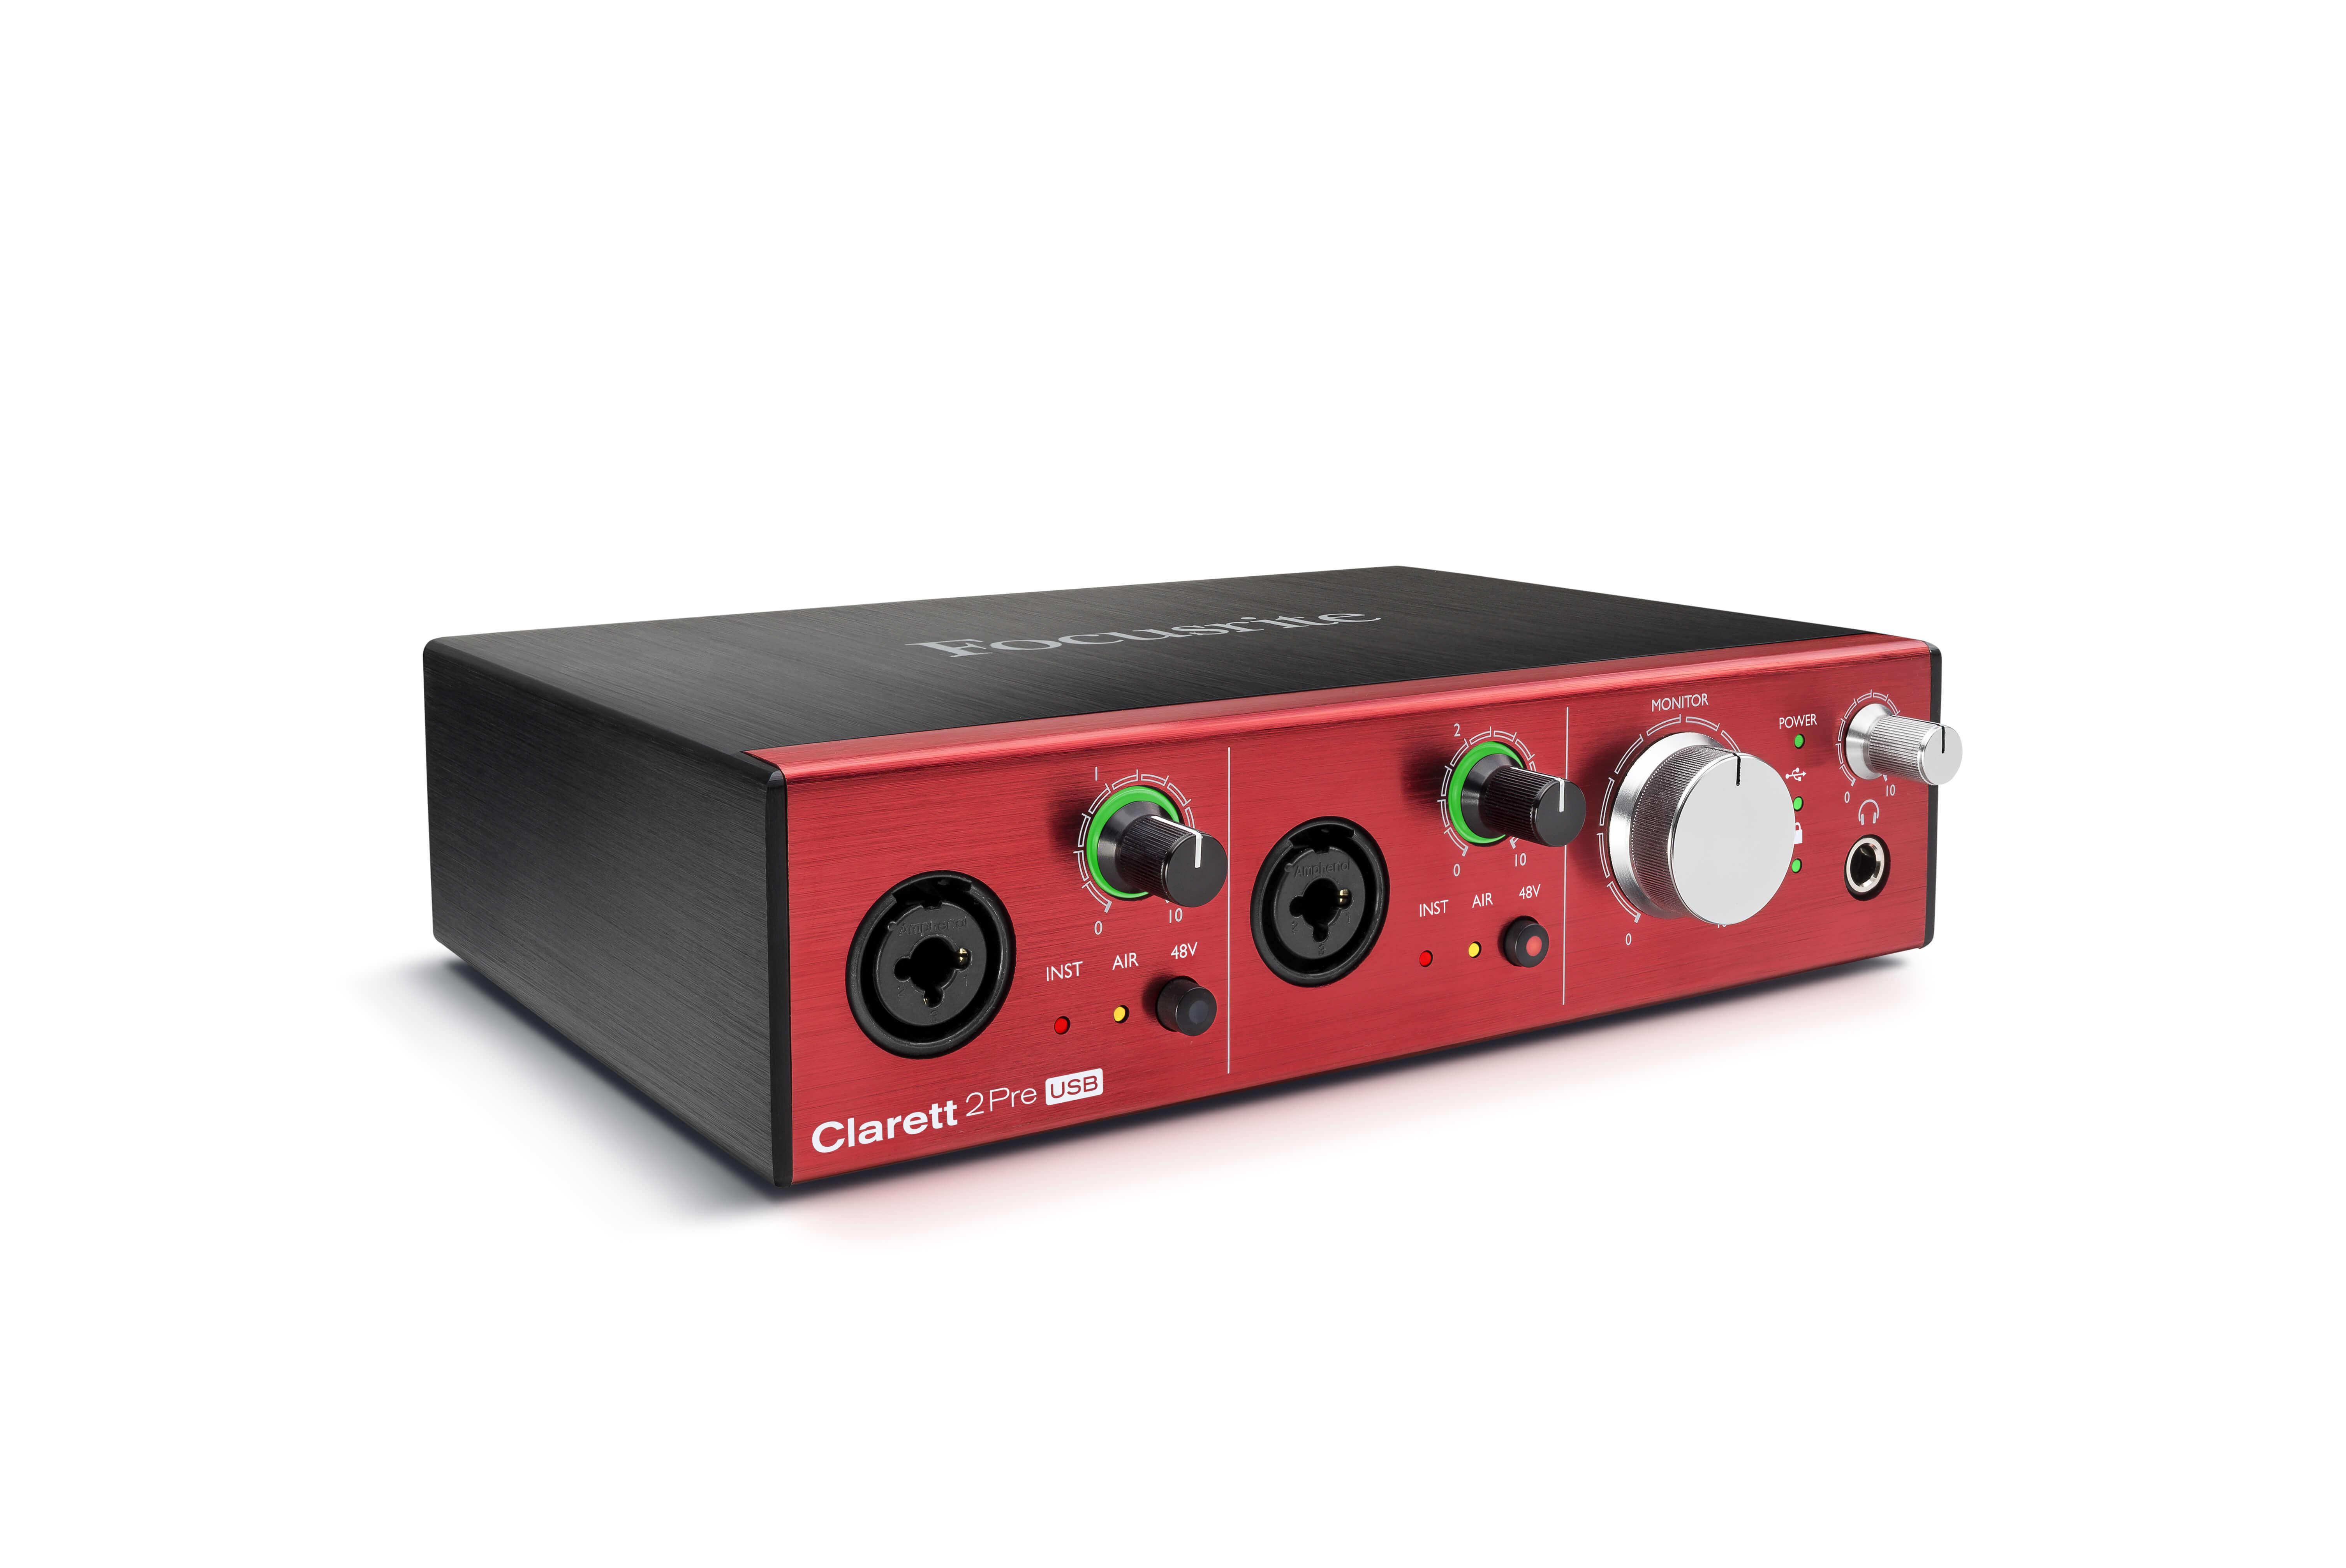 focusrite clarett 2pre usb hero audio interface - right